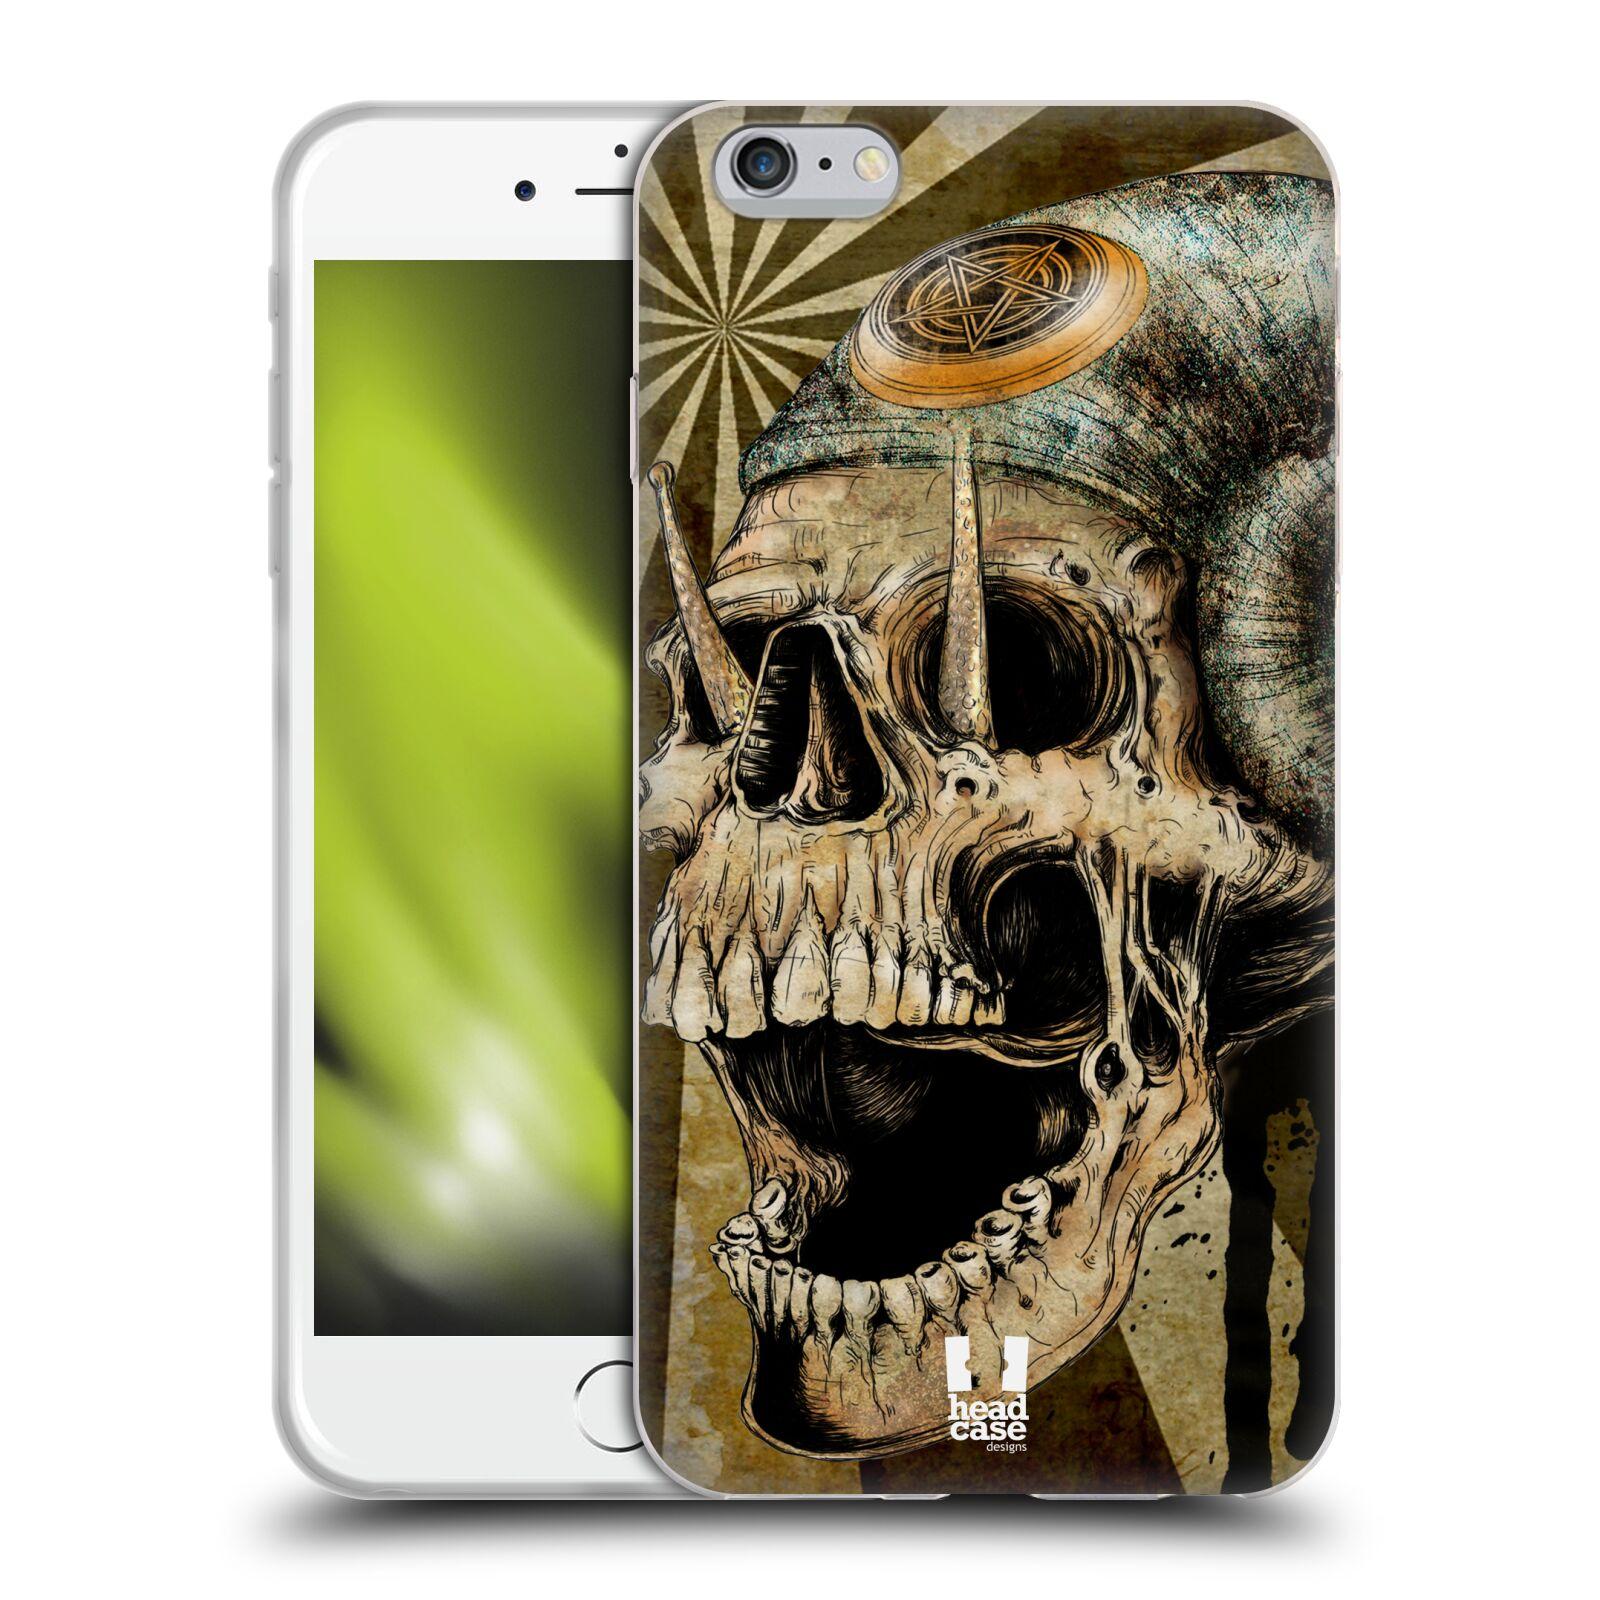 HEAD CASE silikonový obal na mobil Apple Iphone 6 PLUS/ 6S PLUS vzor Kreslené lebky METAL rohy